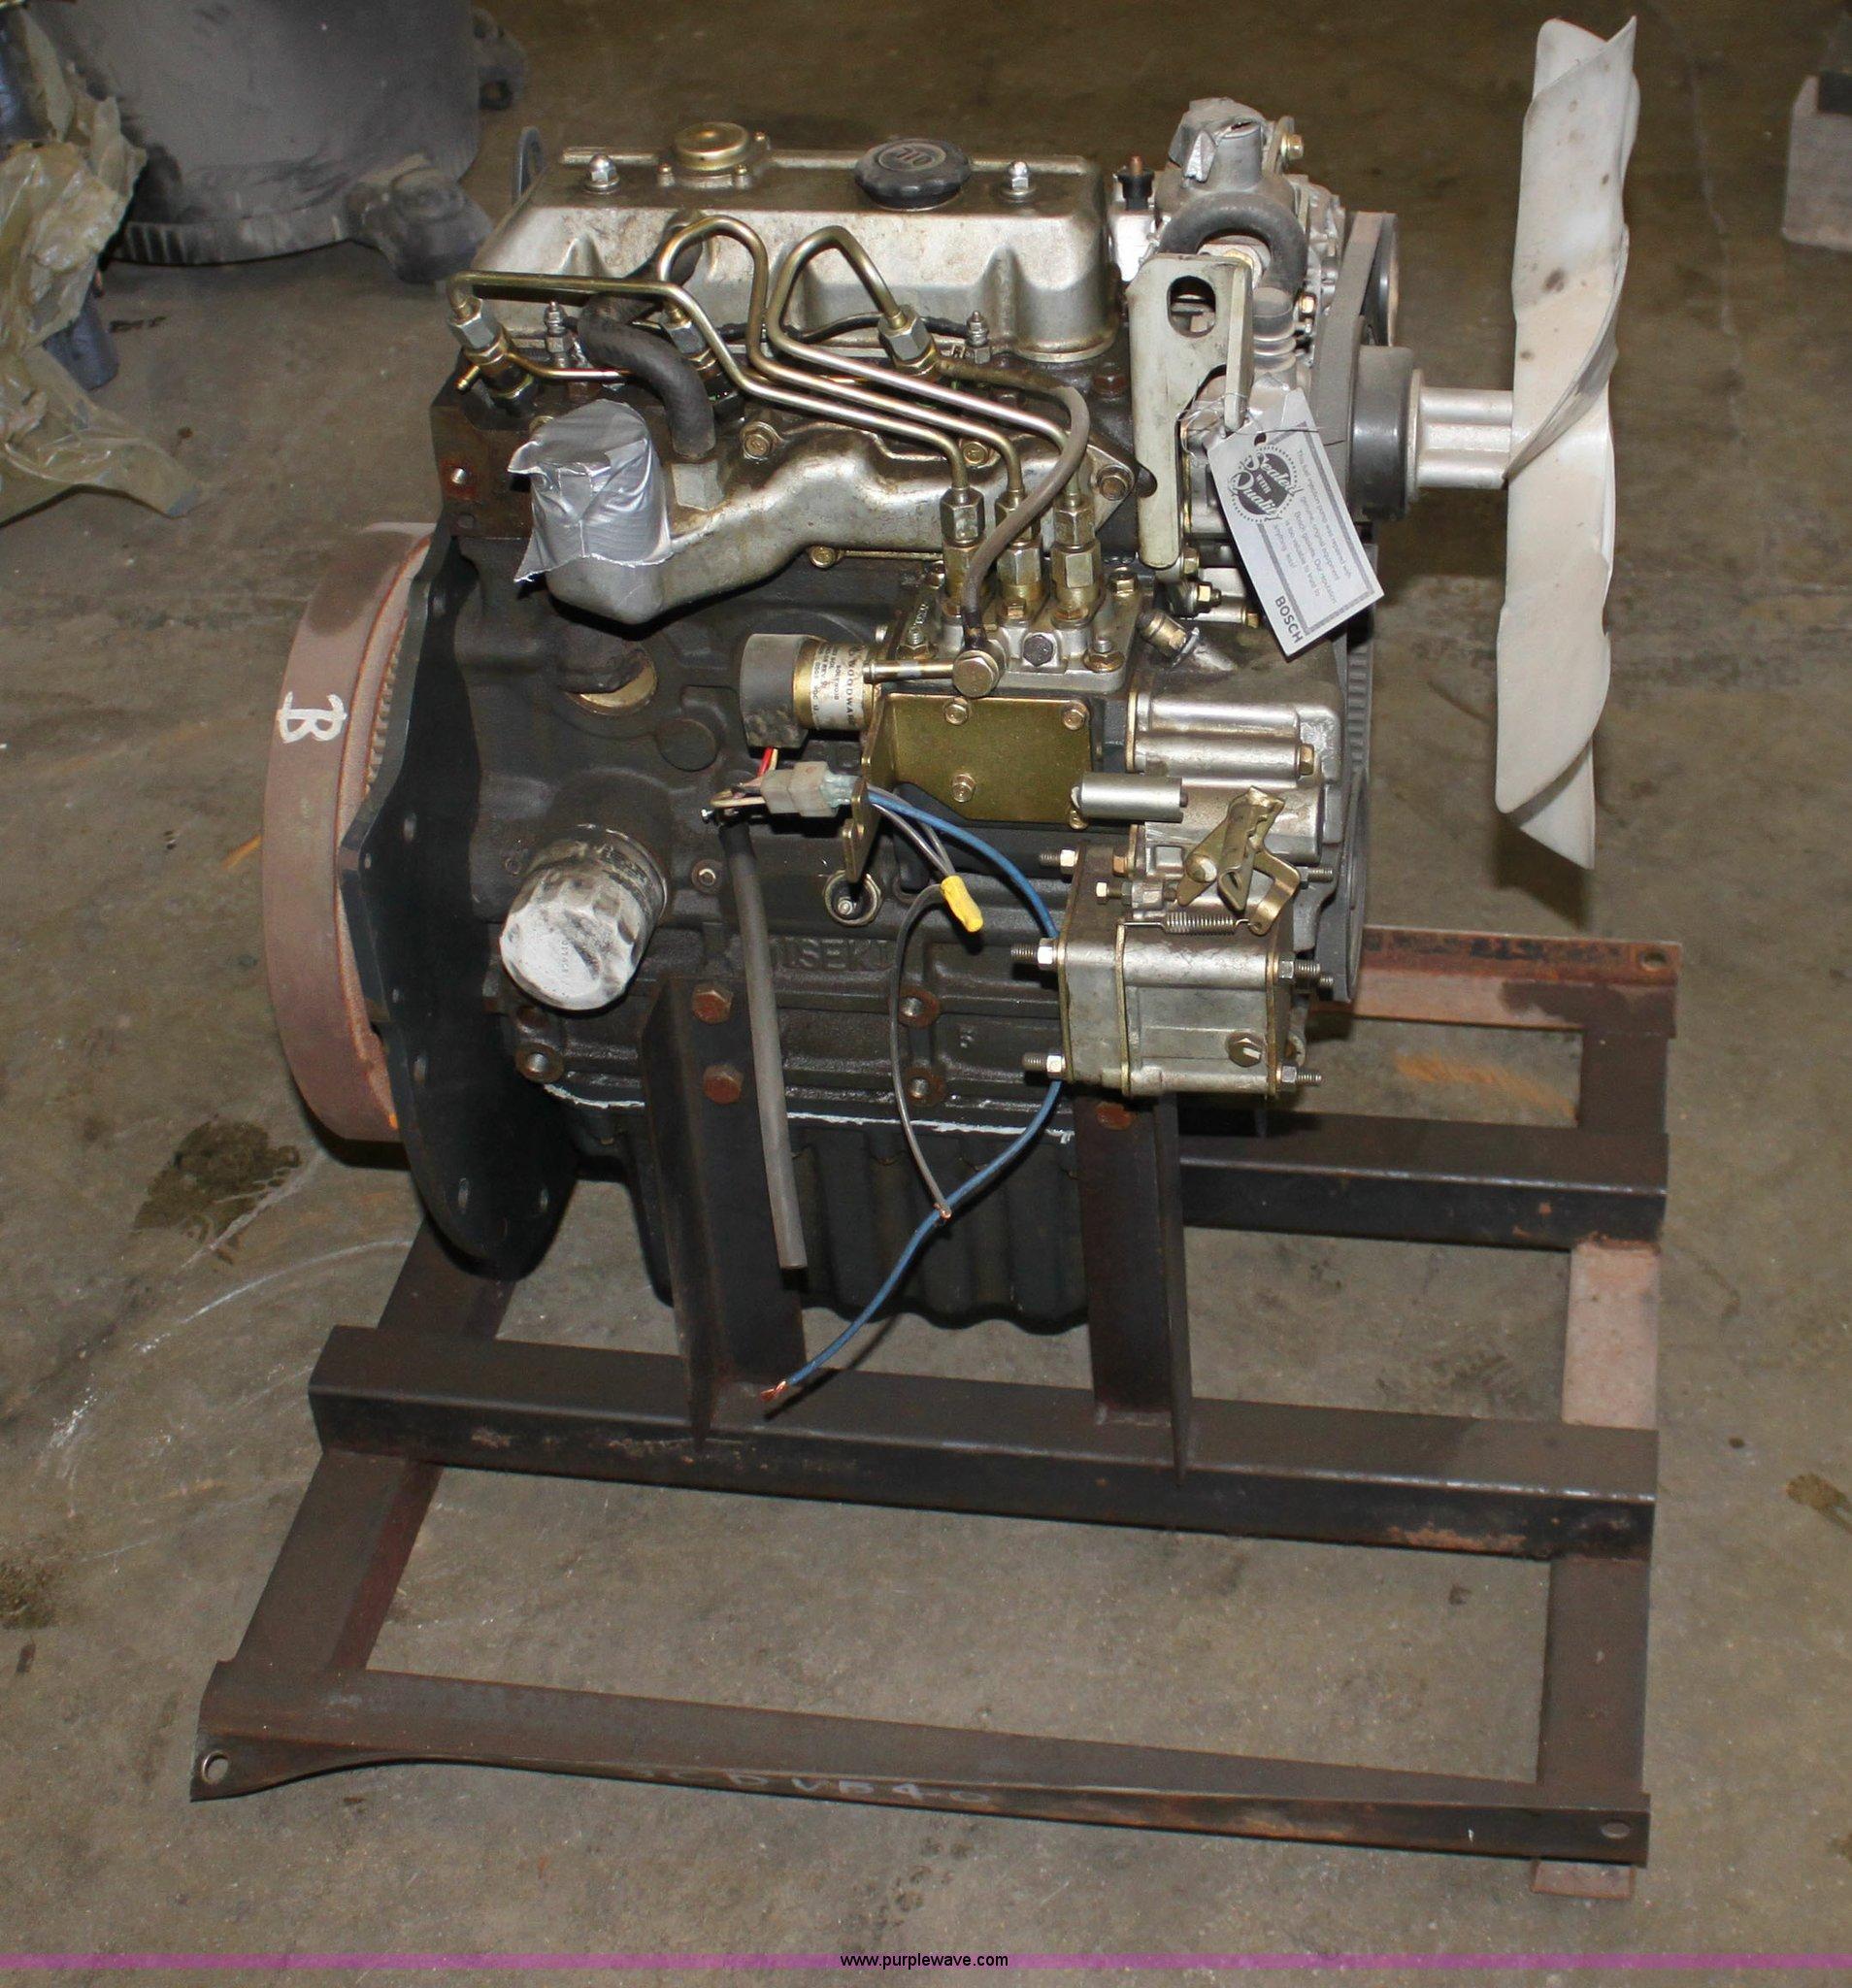 Iseki Engines Engine Diagram Matsuyama Three Cylinder Diesel Item 1908x2048